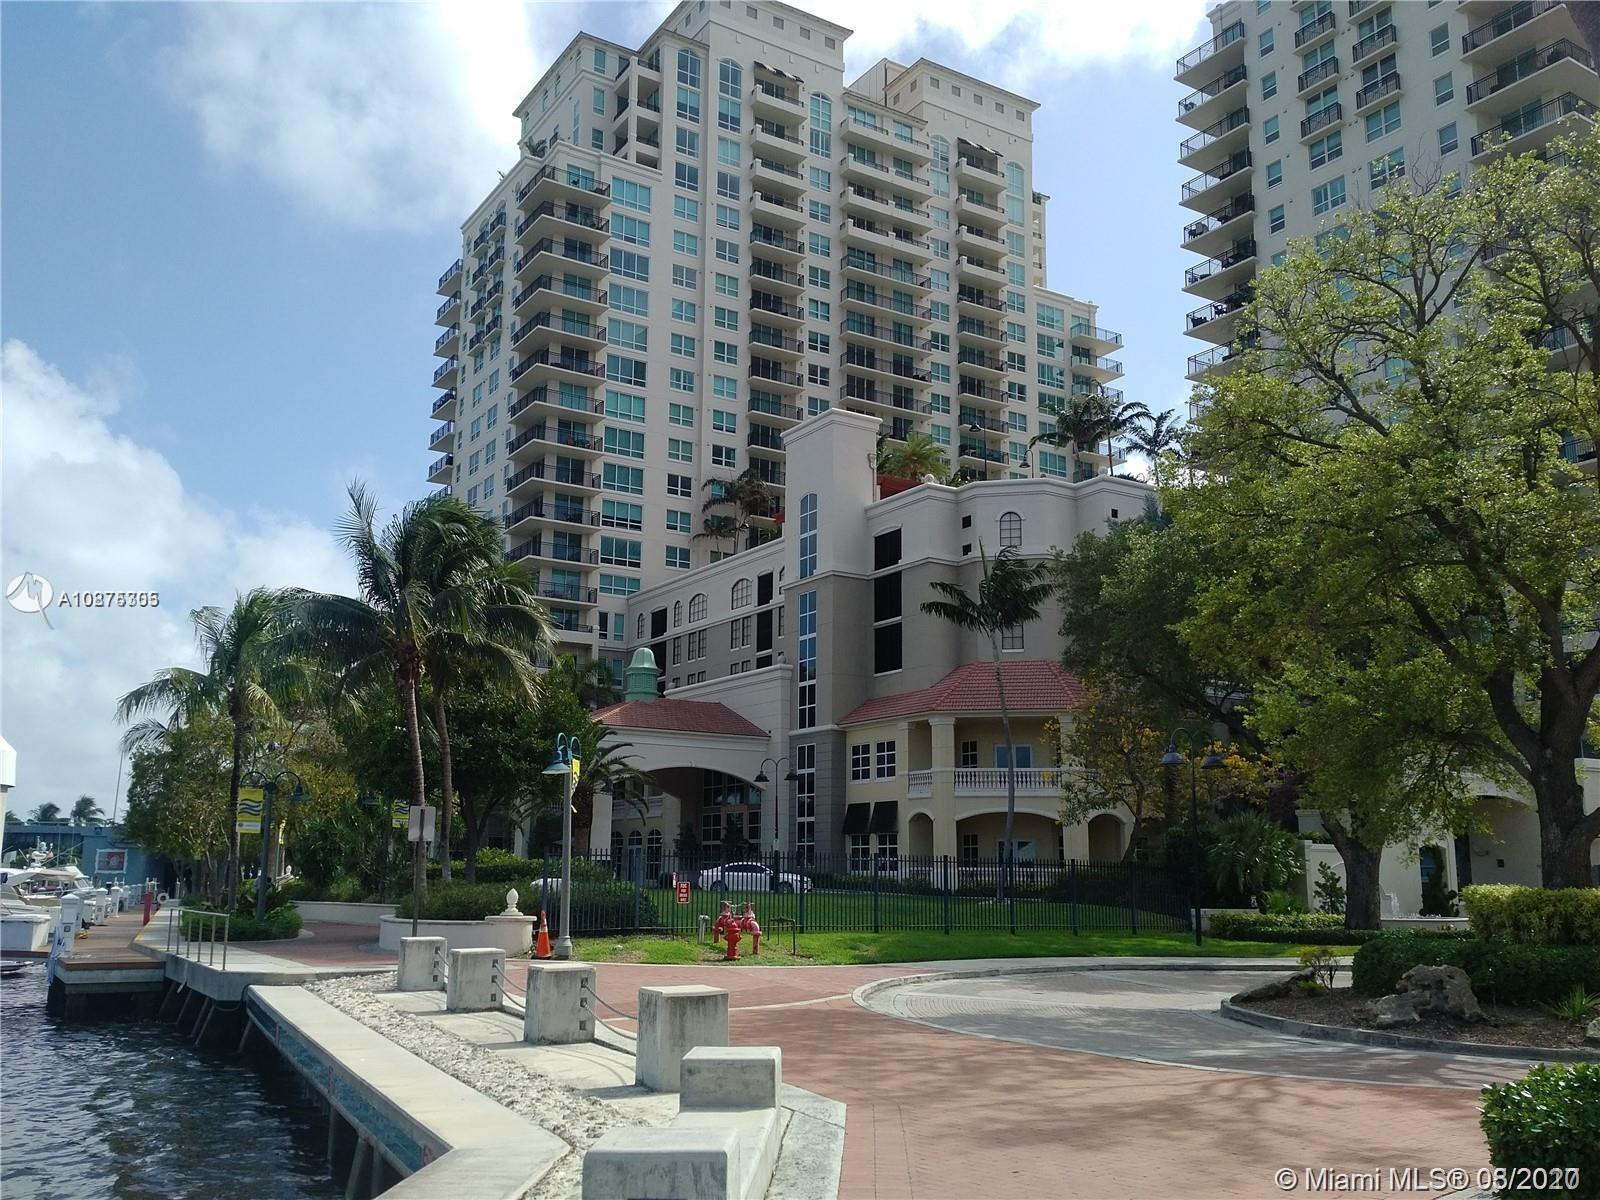 Symphony #1011N - 610 W Las Olas Blvd #1011N, Fort Lauderdale, FL 33312